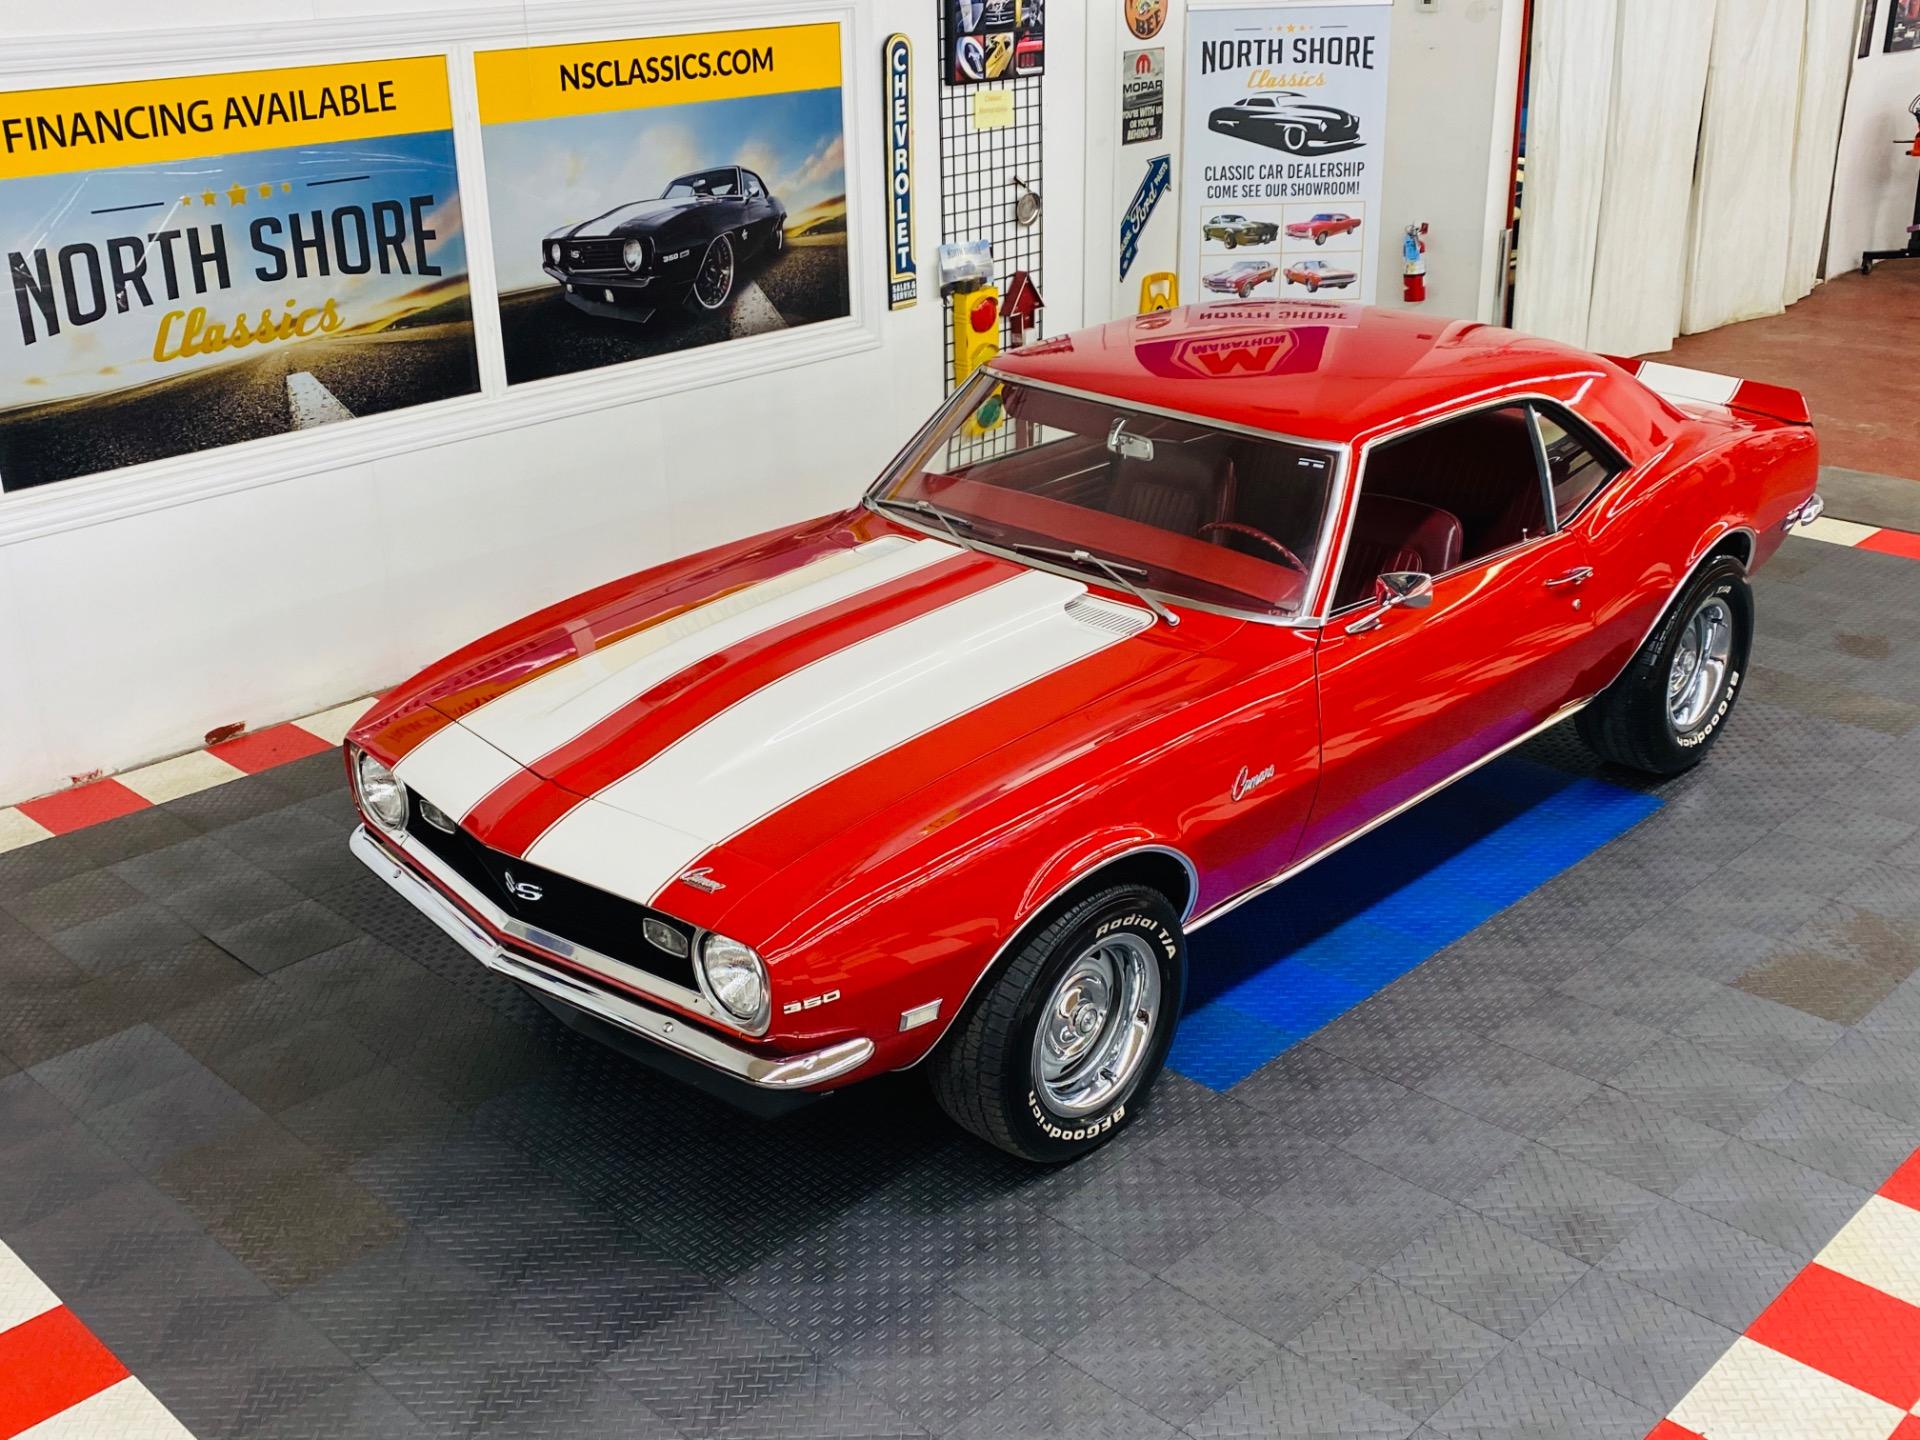 Used 1968 Chevrolet Camaro - 350 ENGINE - 4 SPEED - 12 BOLT REAR - SEE VIDEO | Mundelein, IL